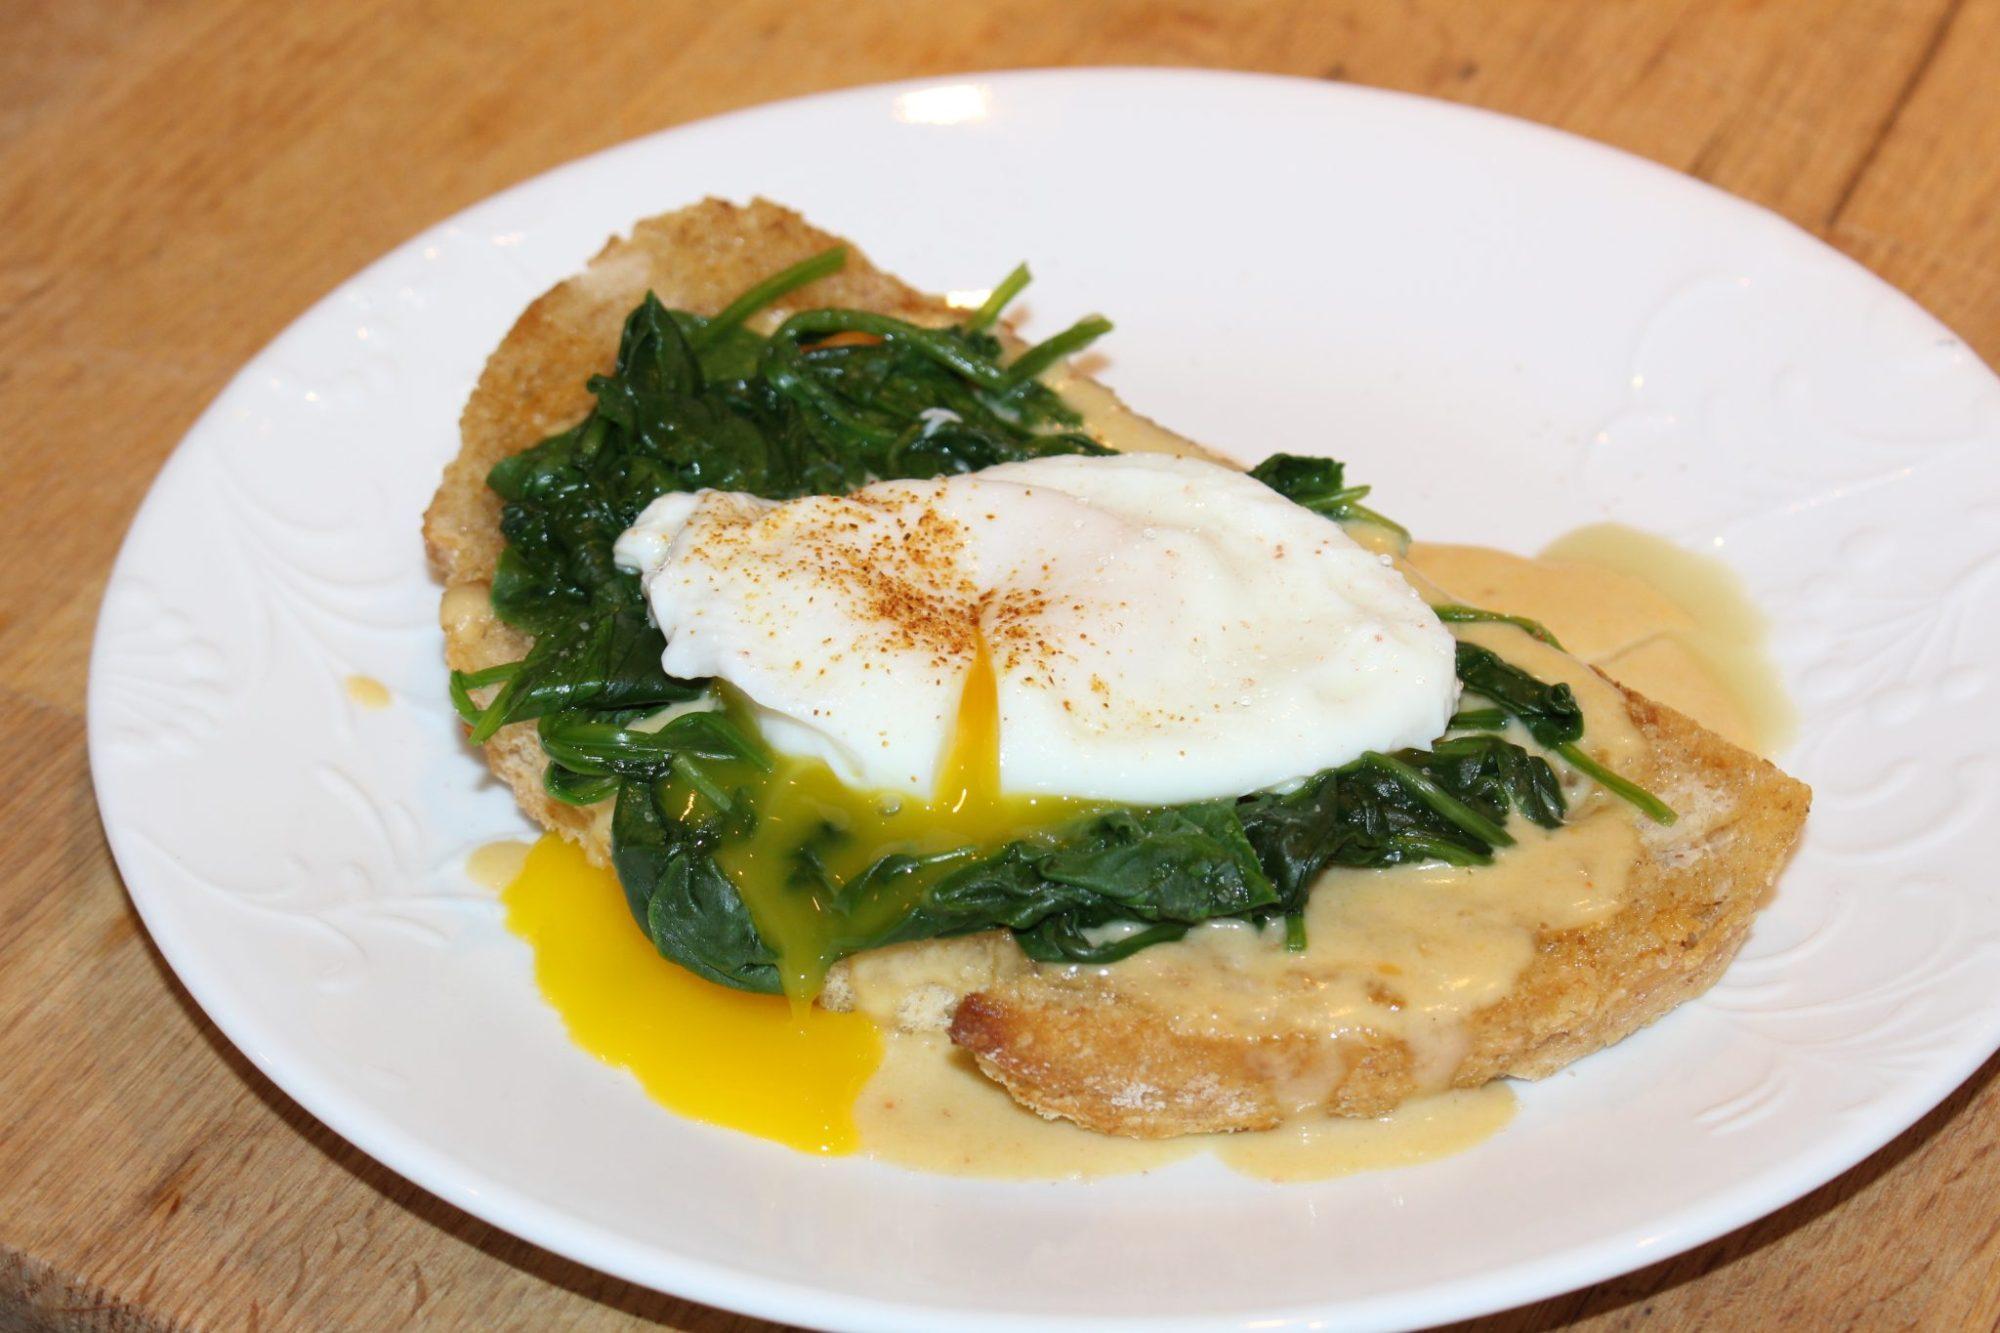 Buck Rarebit - Welsh Rarebit with egg and spinach